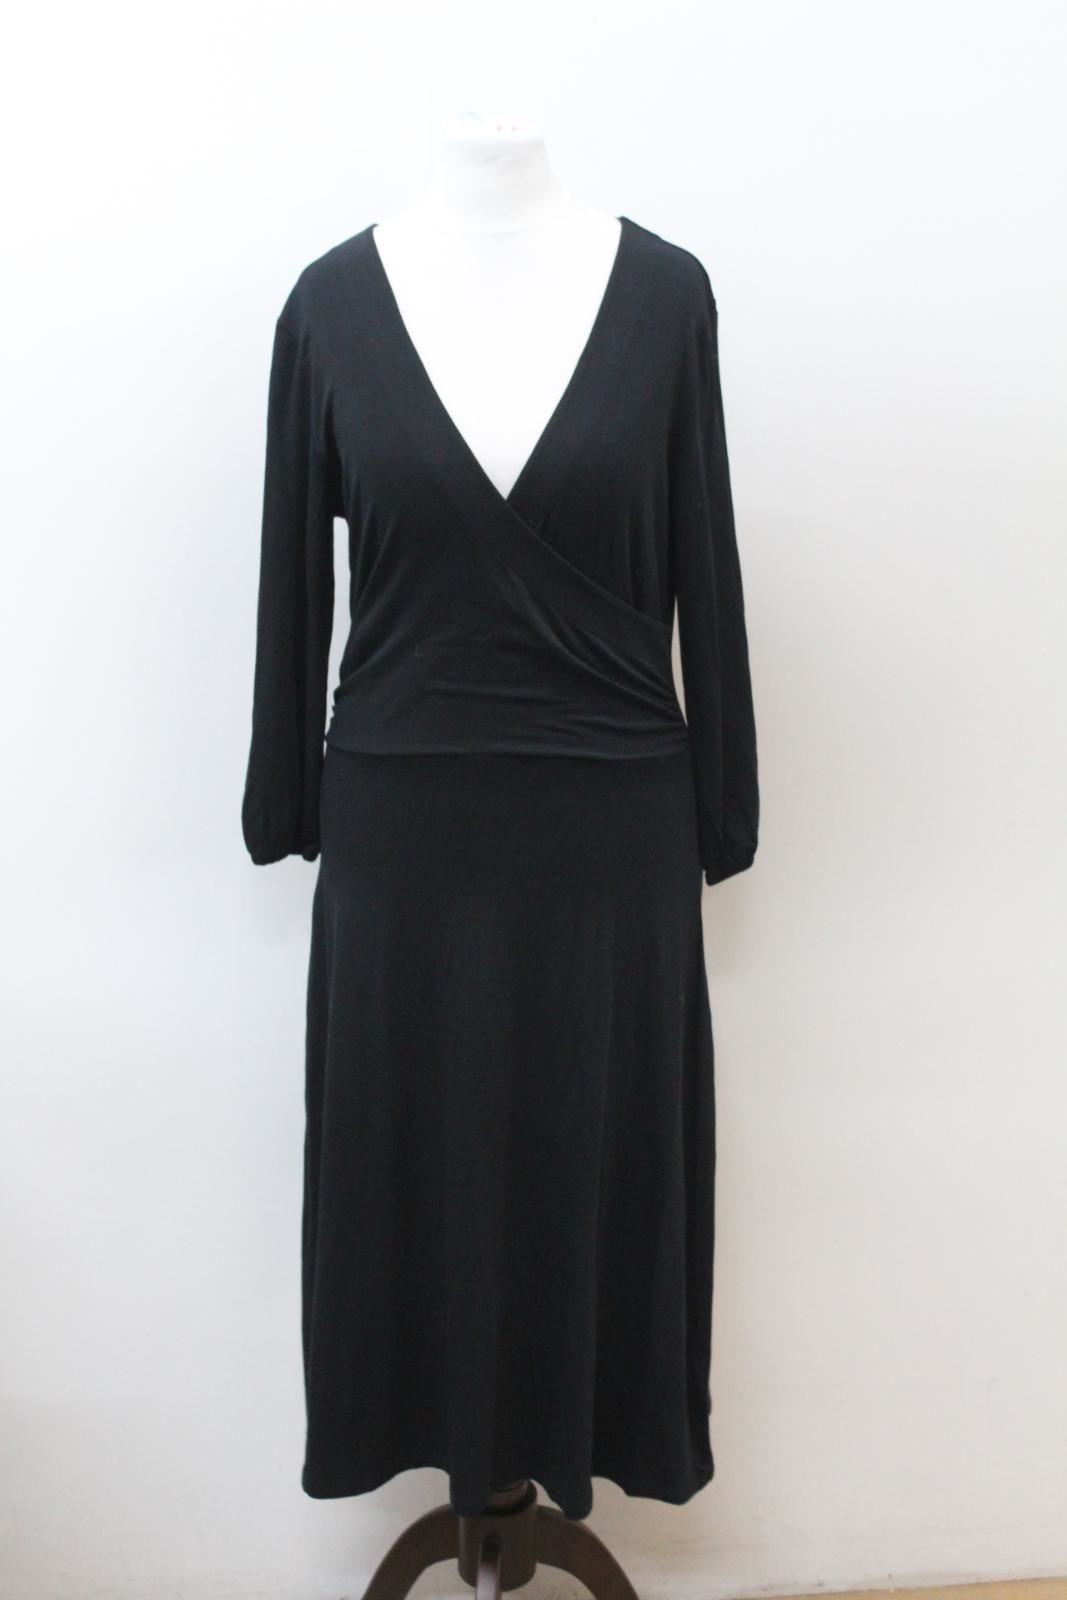 BODEN-Ladies-Black-3-4-Sleeve-V-Neckline-Shift-Style-Dress-Size-UK12-EU40